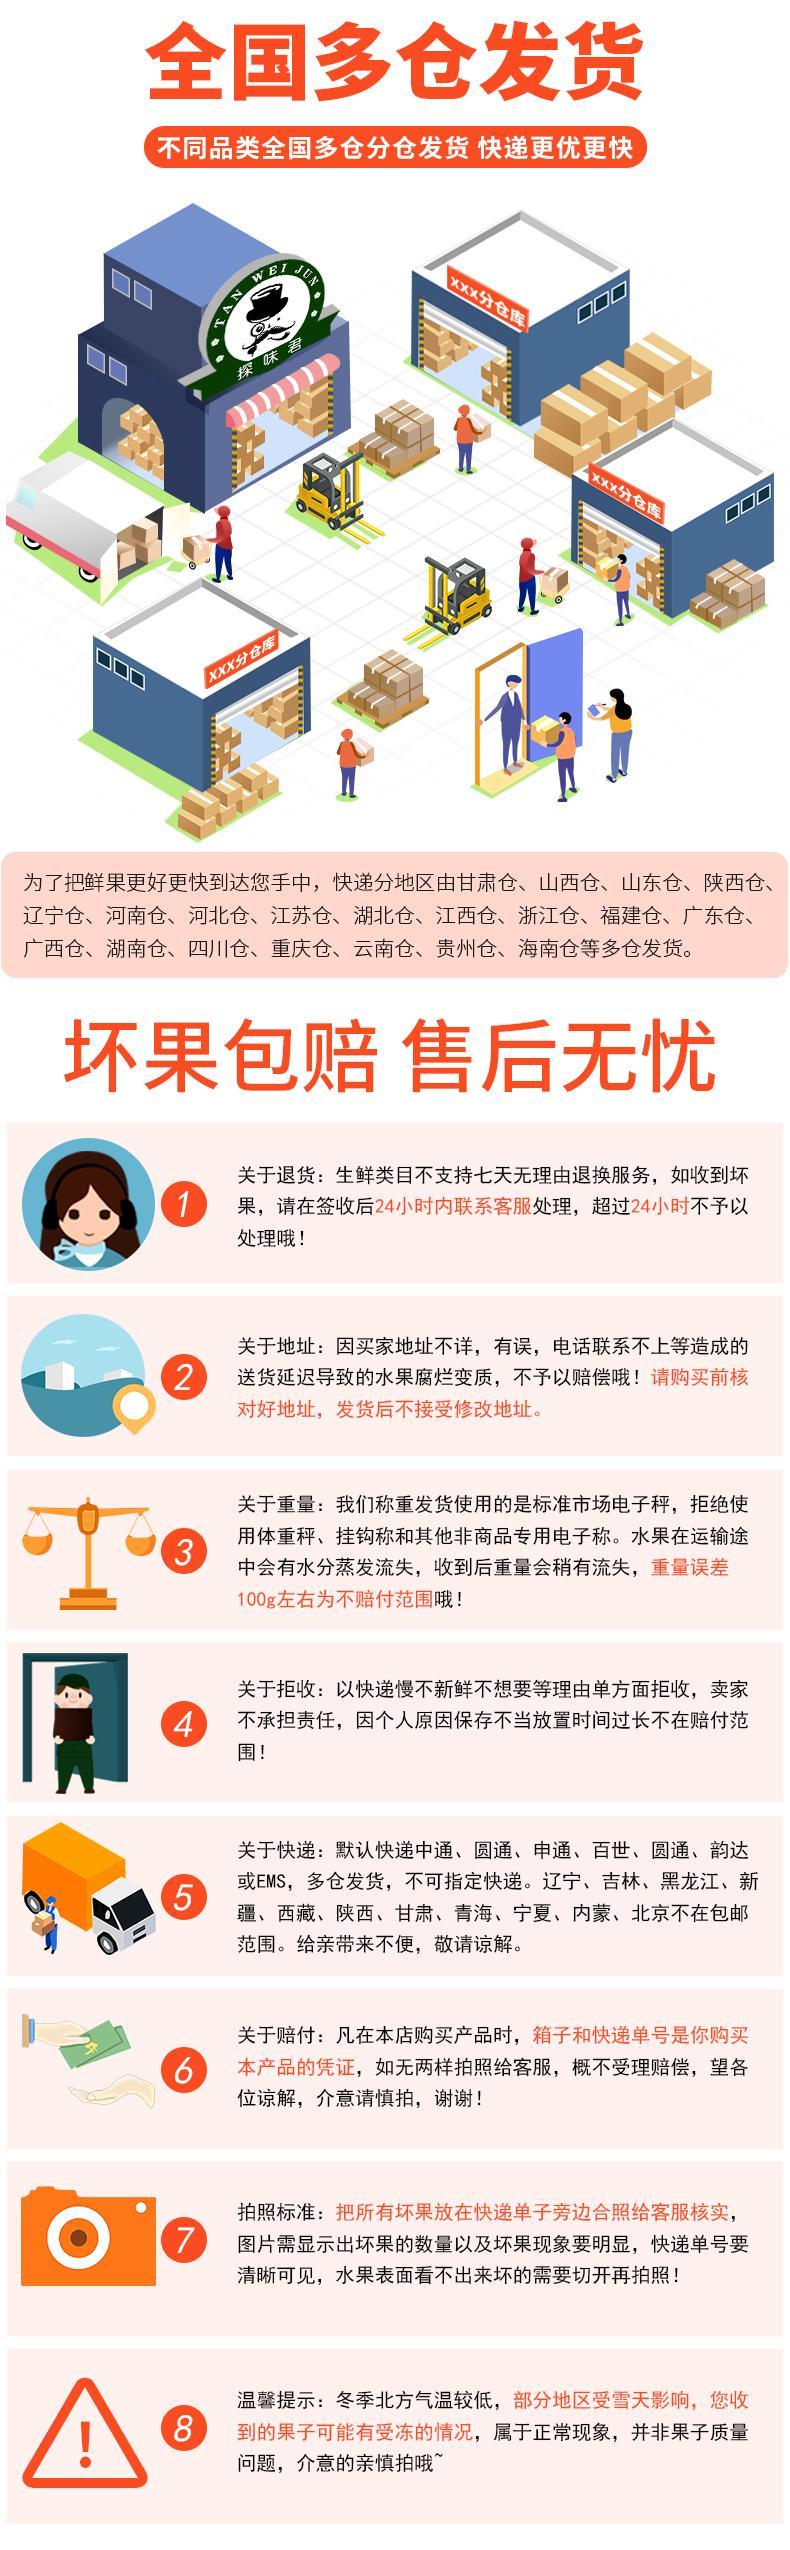 http://b2bwings-goods-image.oss-cn-shenzhen.aliyuncs.com/3a92dacf-ddde-442f-804a-f7684ca49dd8.jpg